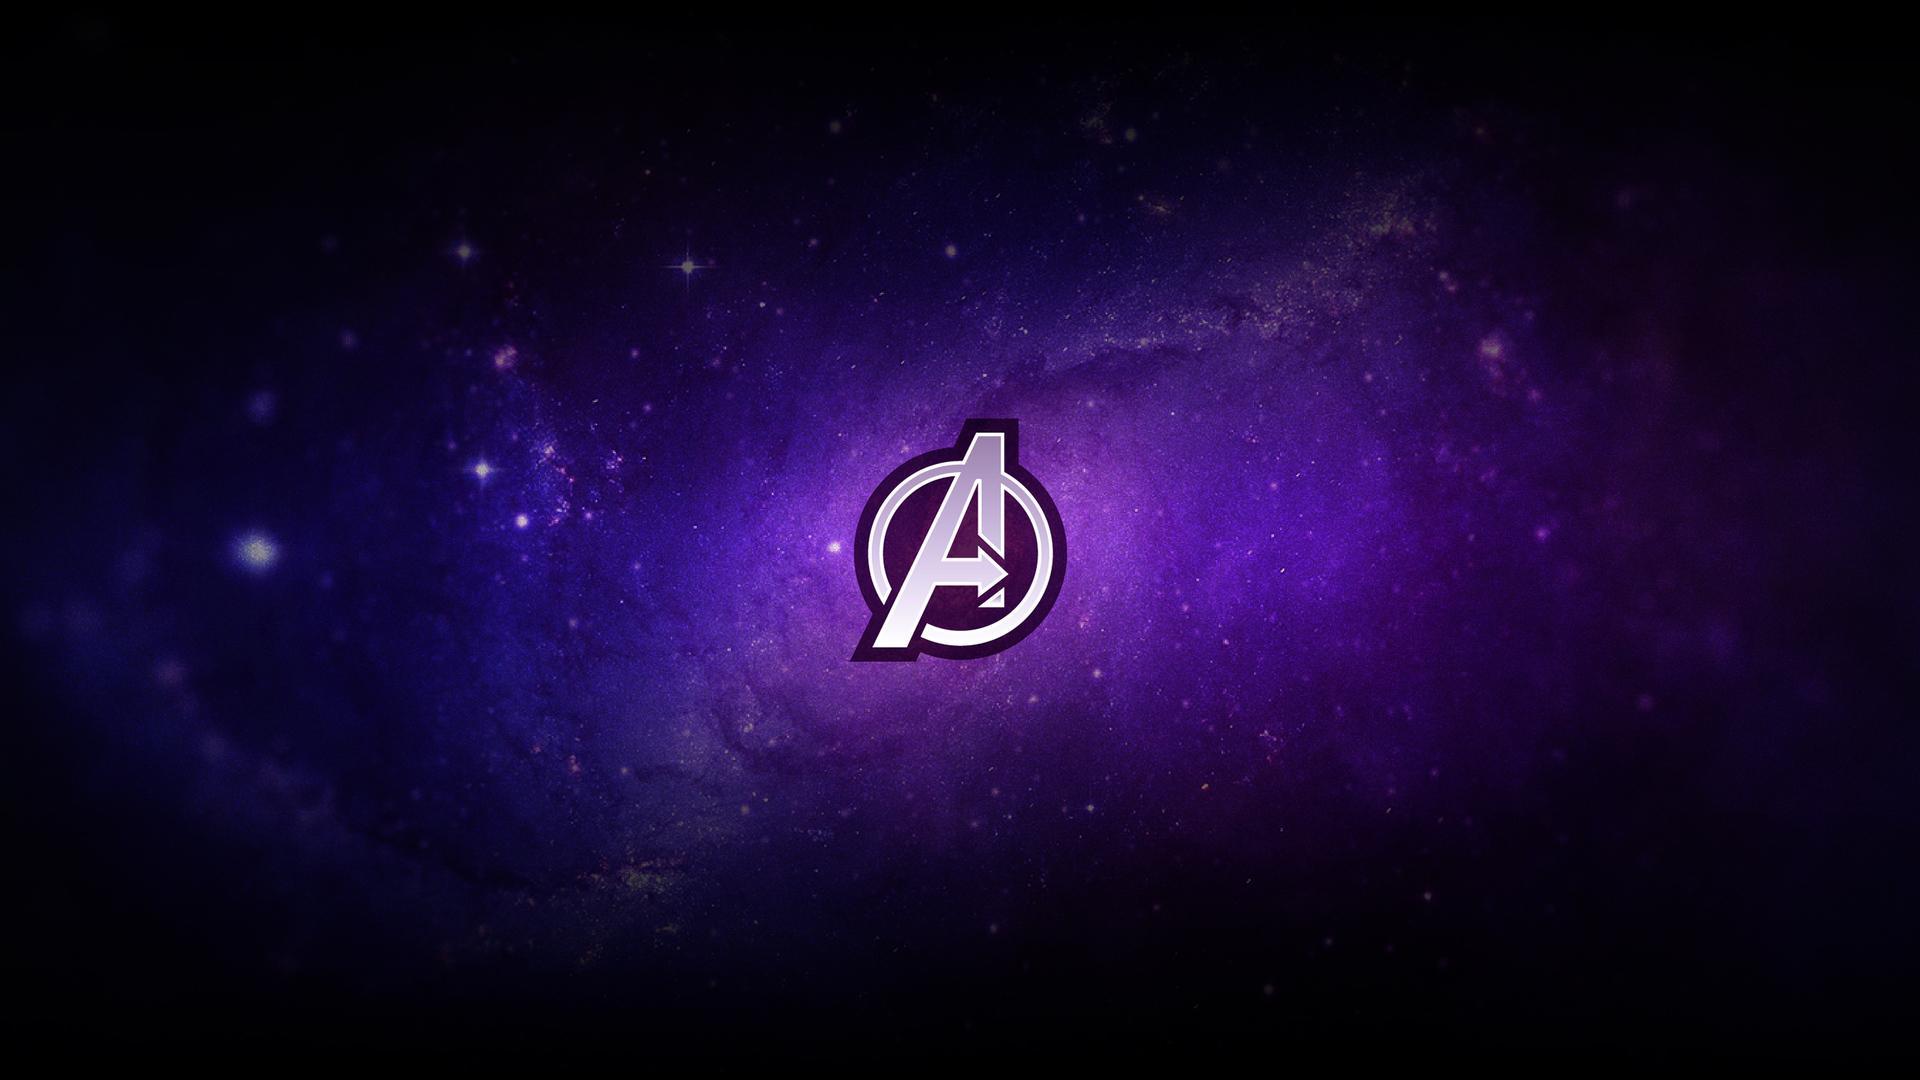 Download Avenger Logo Wallpaper Hd Backgrounds Download